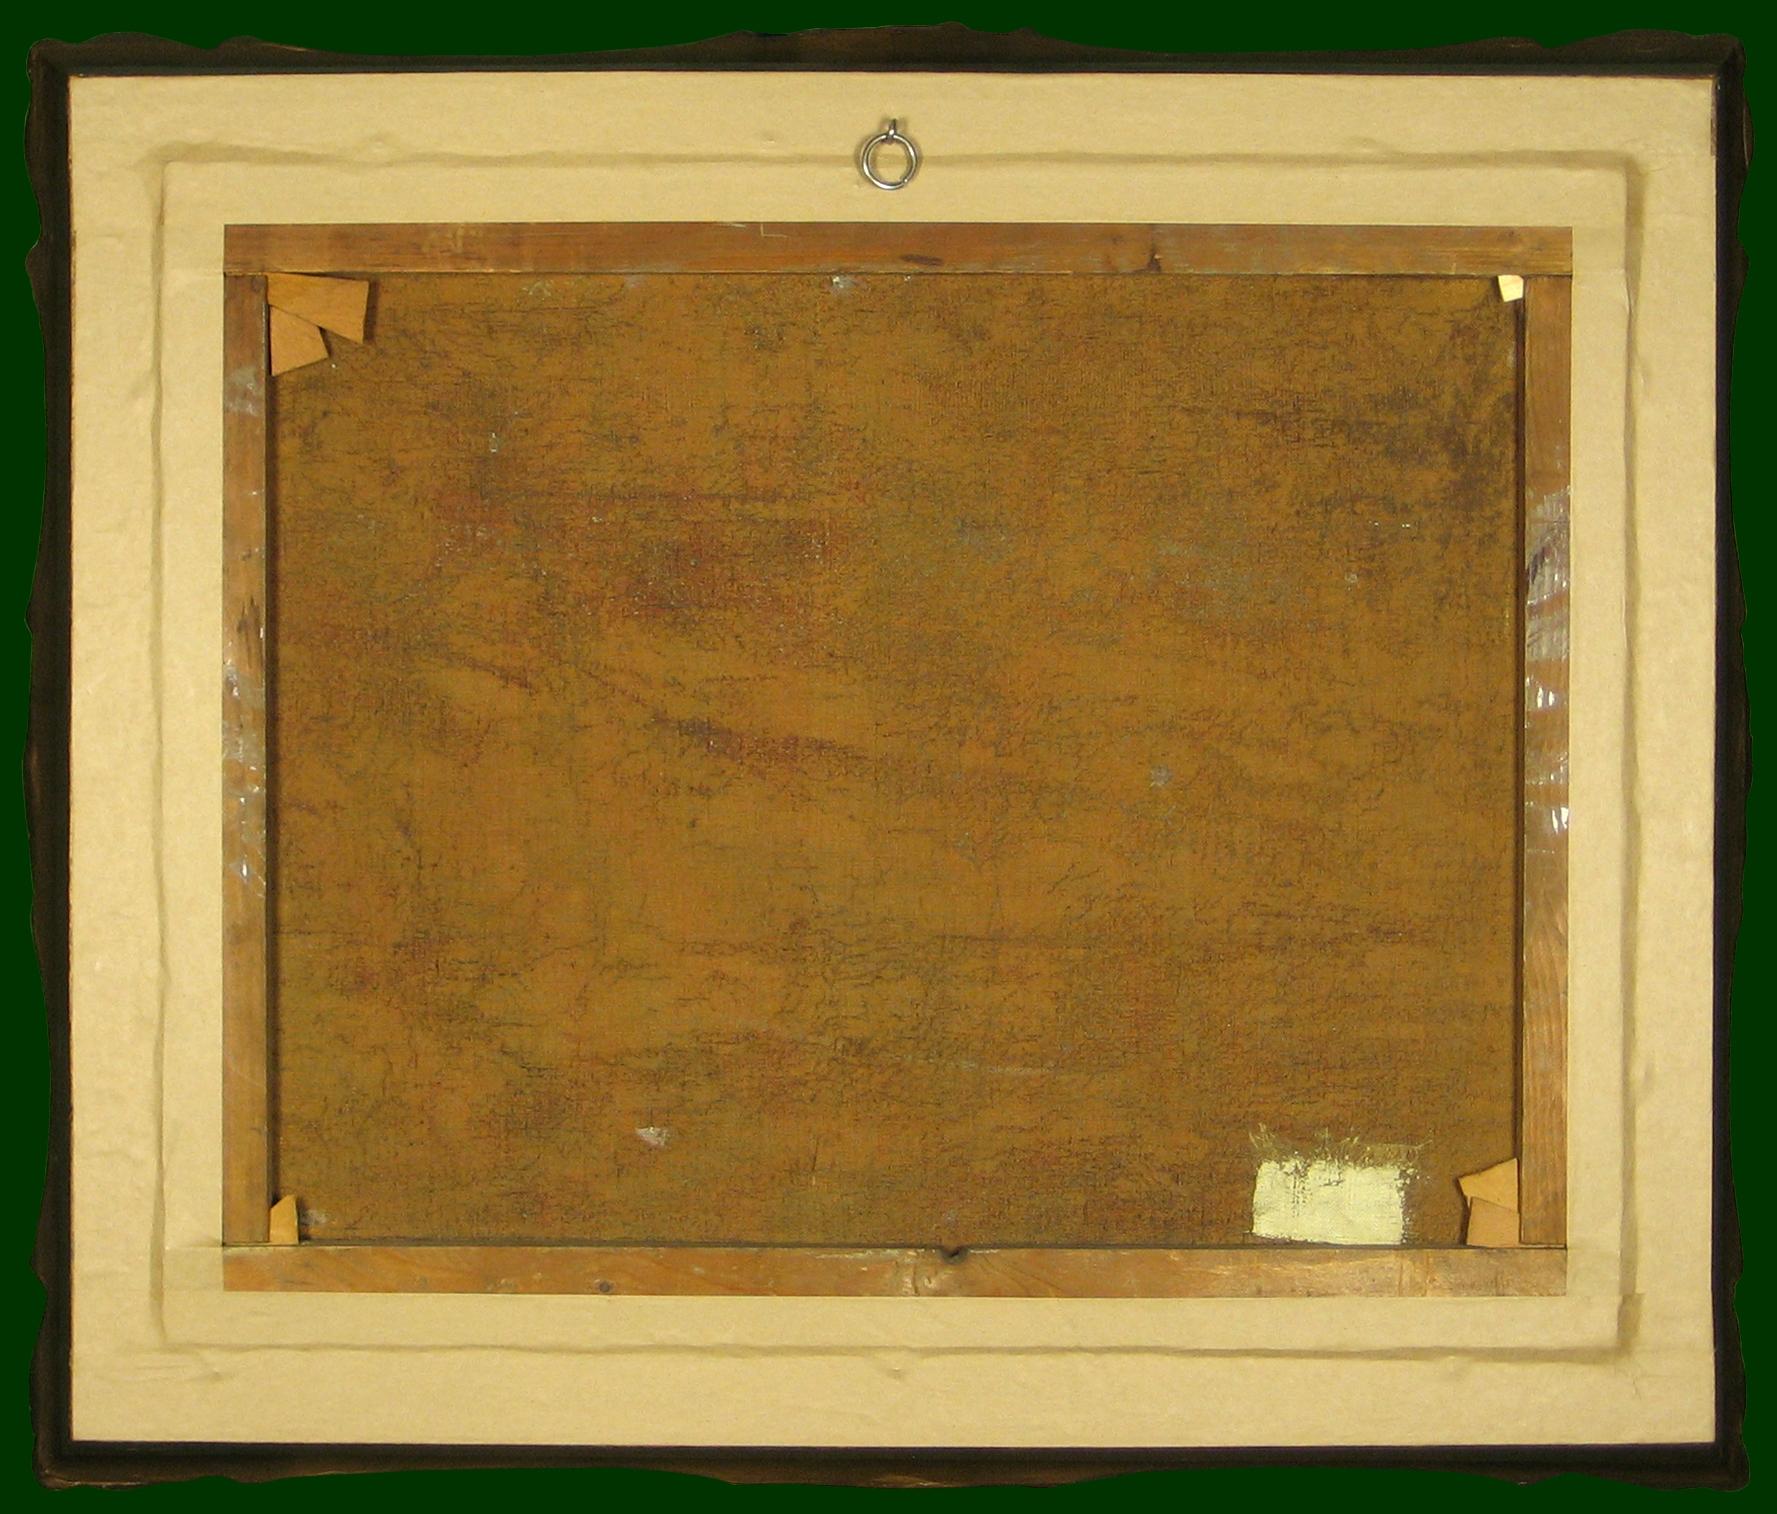 11-4h_t.jpg (1777×1514)